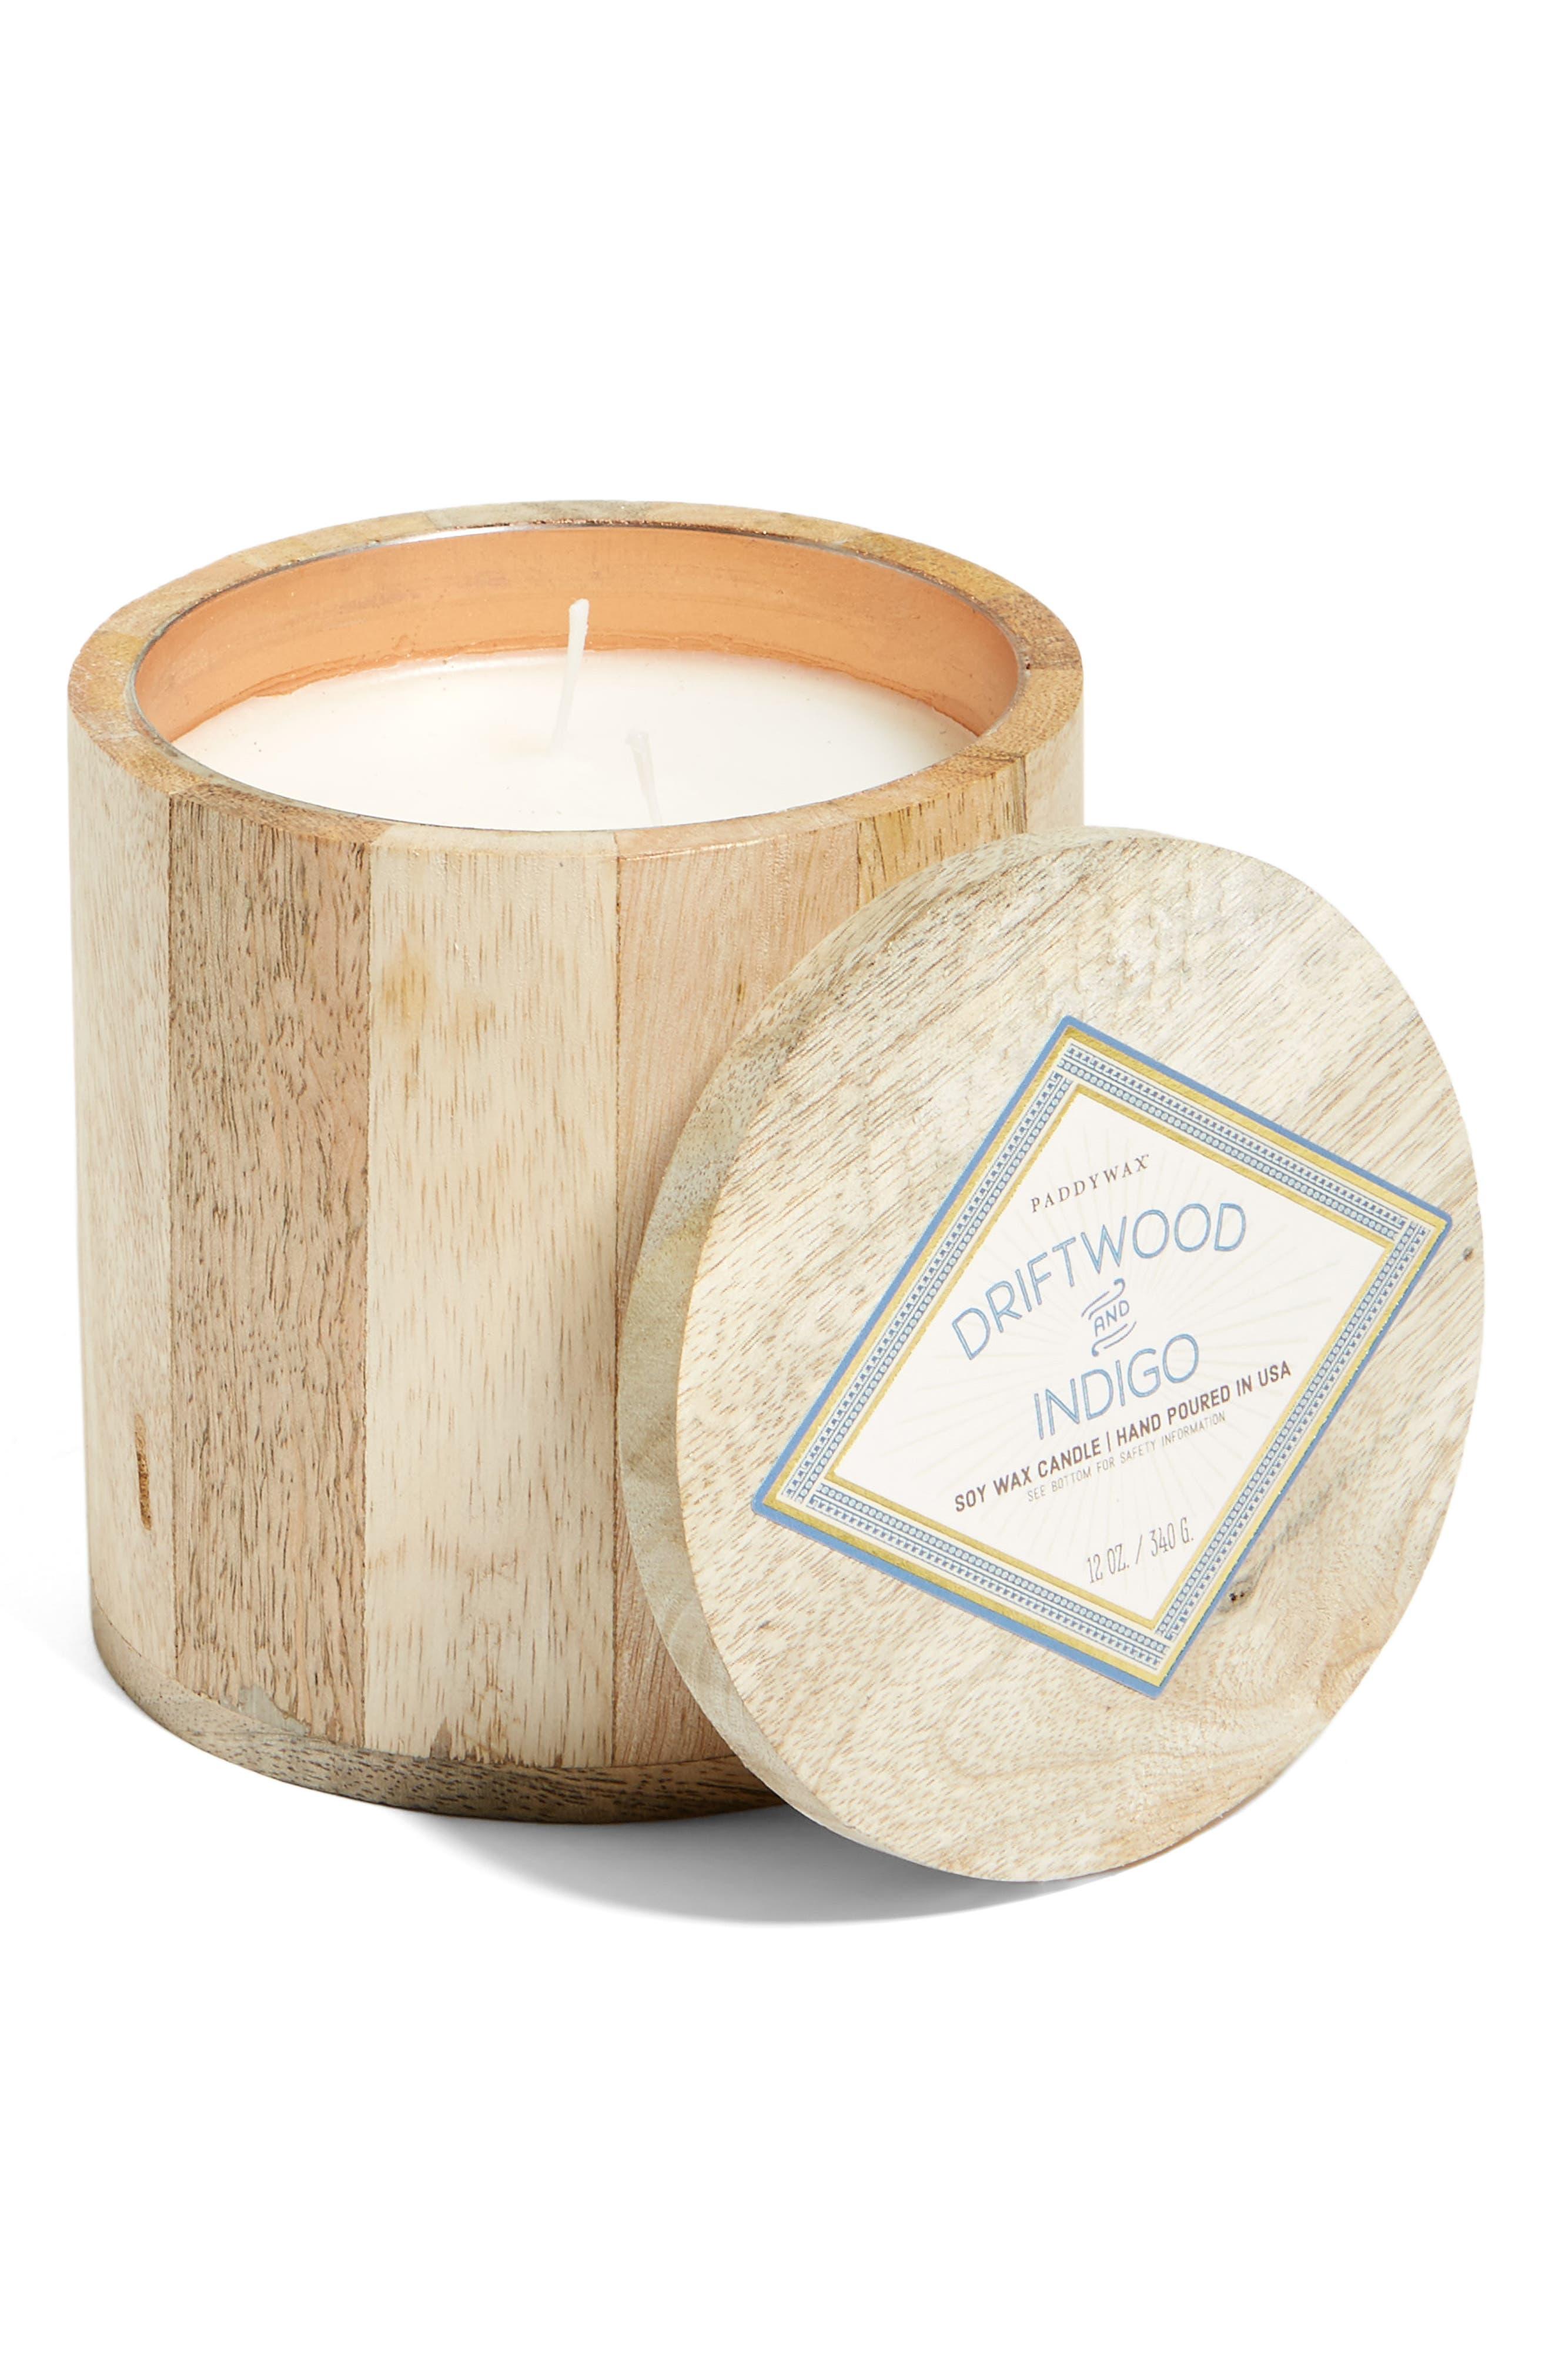 PADDYWAX Driftwood & Indigo Soy Wax Candle, Main, color, 200